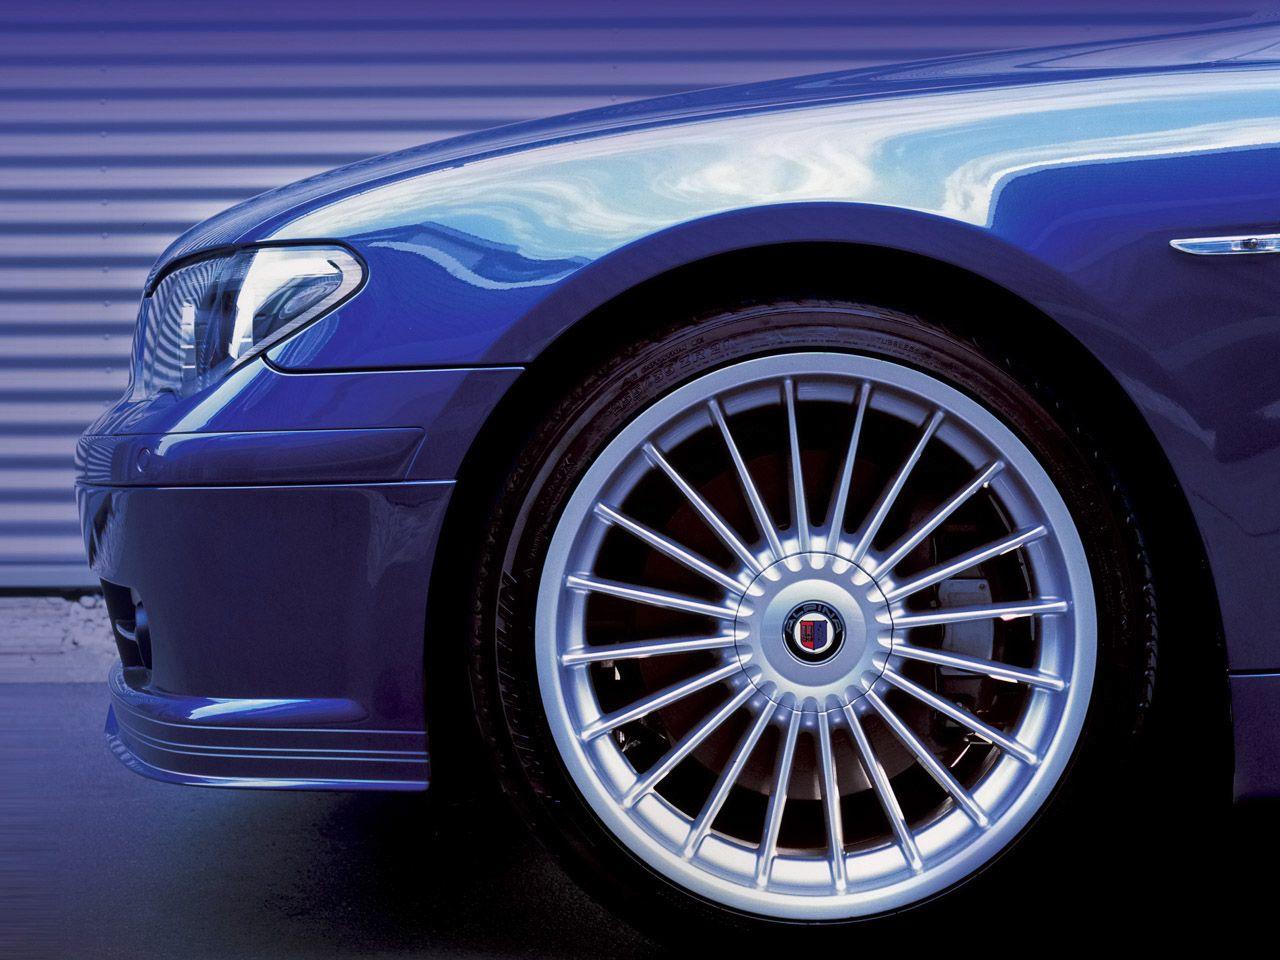 Alpina Wheels Rims Used BMW Beemers Pinterest BMW Bmw - Alpina rims bmw